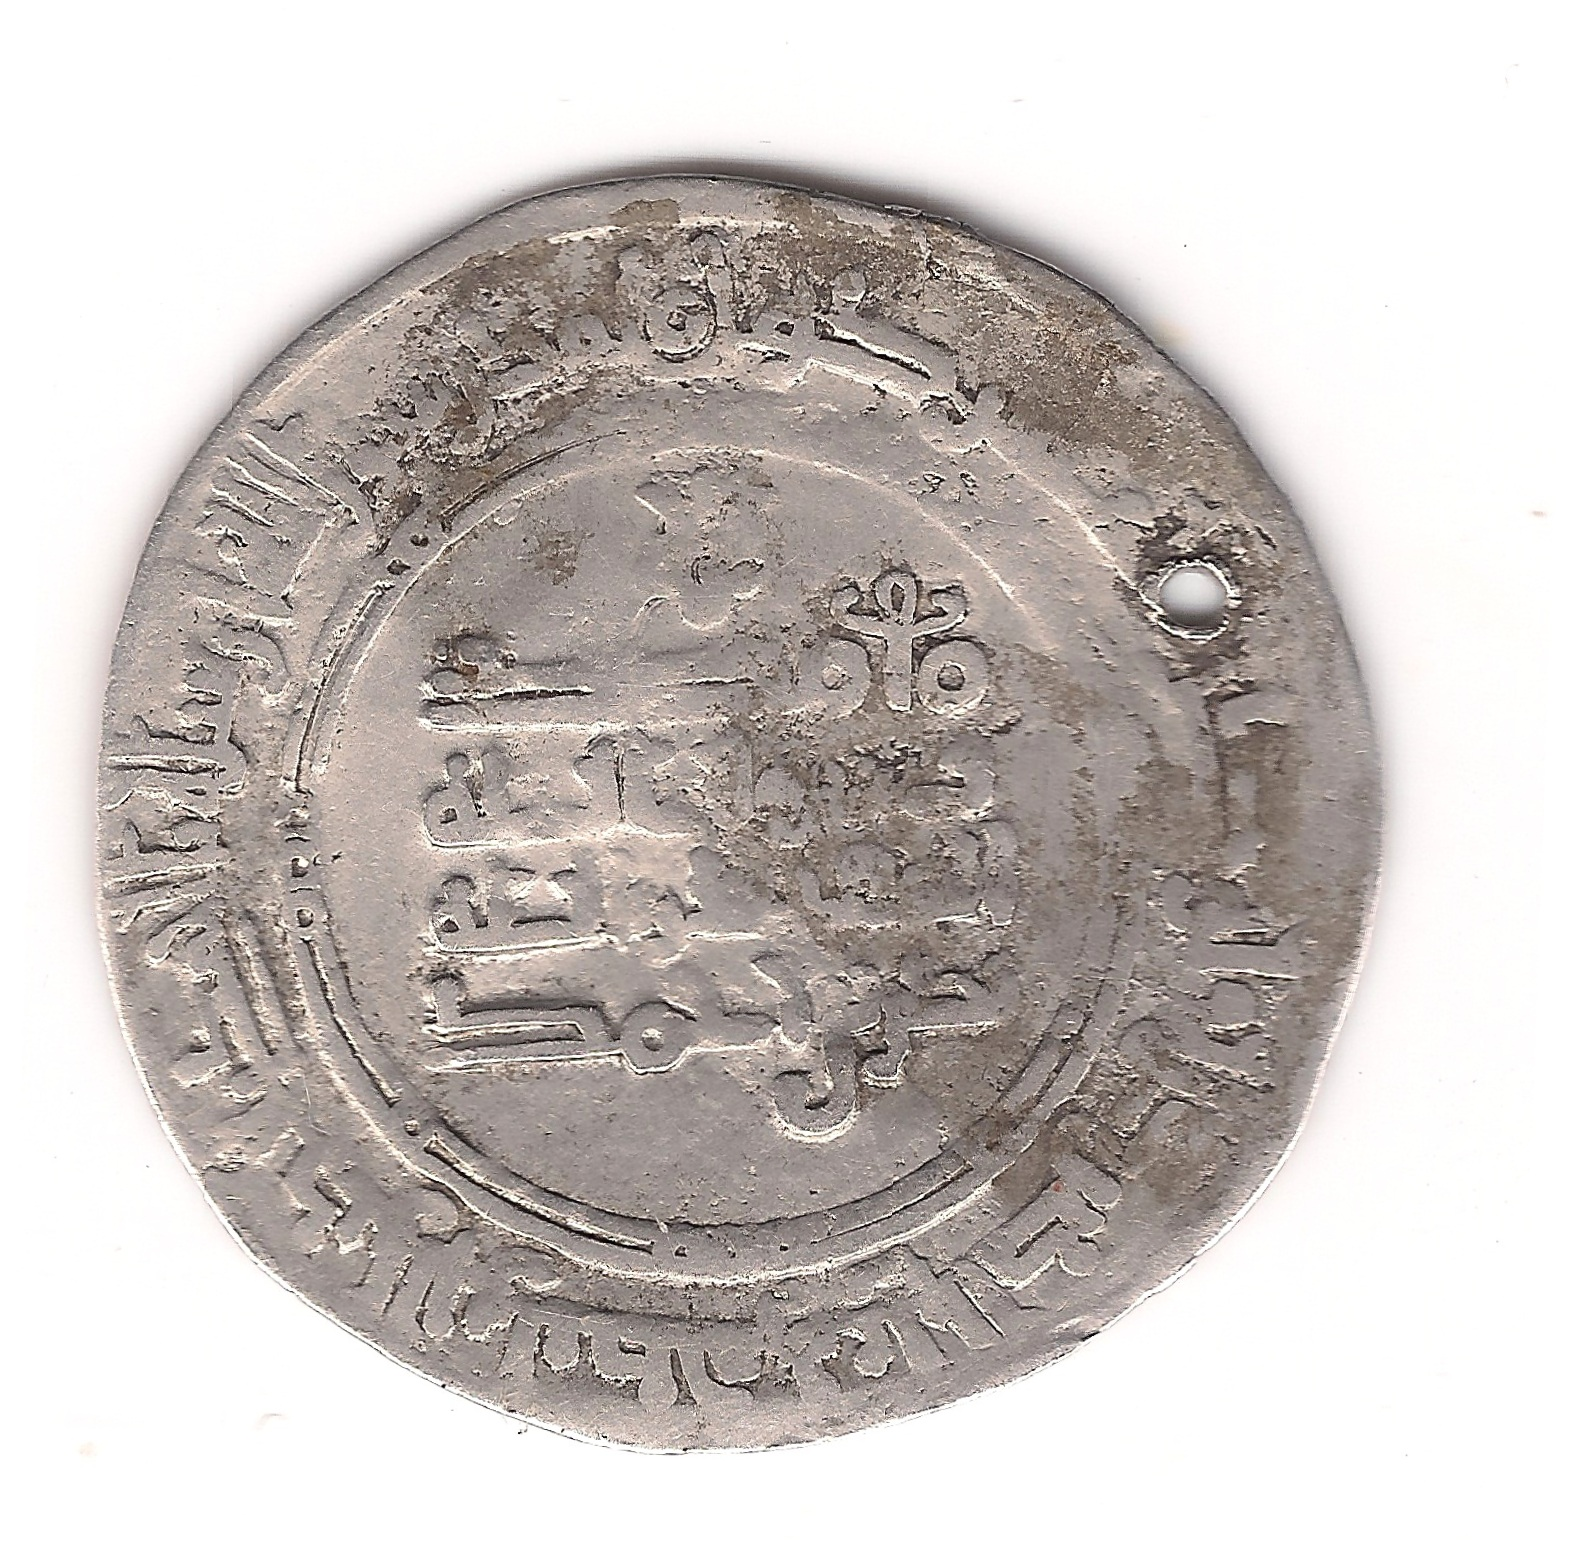 Dirham Samanid de Nasr bin Ahmed (913-42 AD) ceca al-Shash Side+a